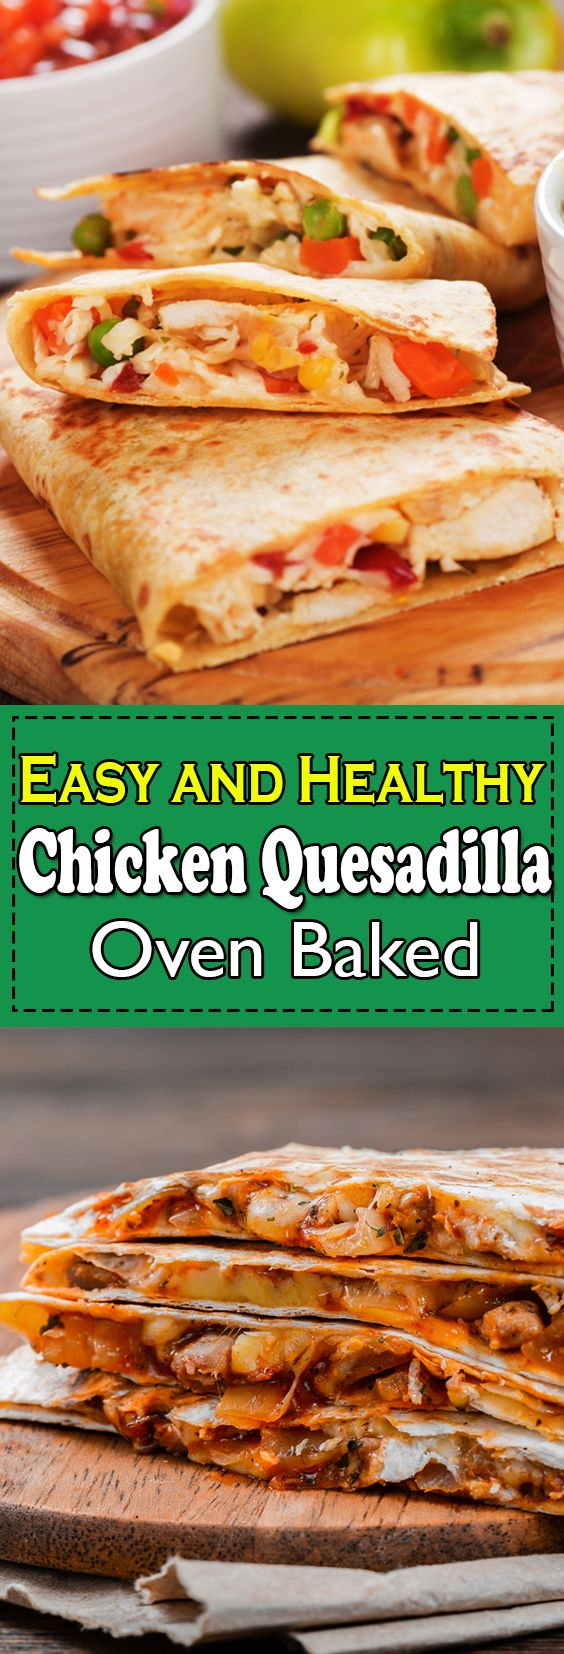 Chicken Quesadilla images